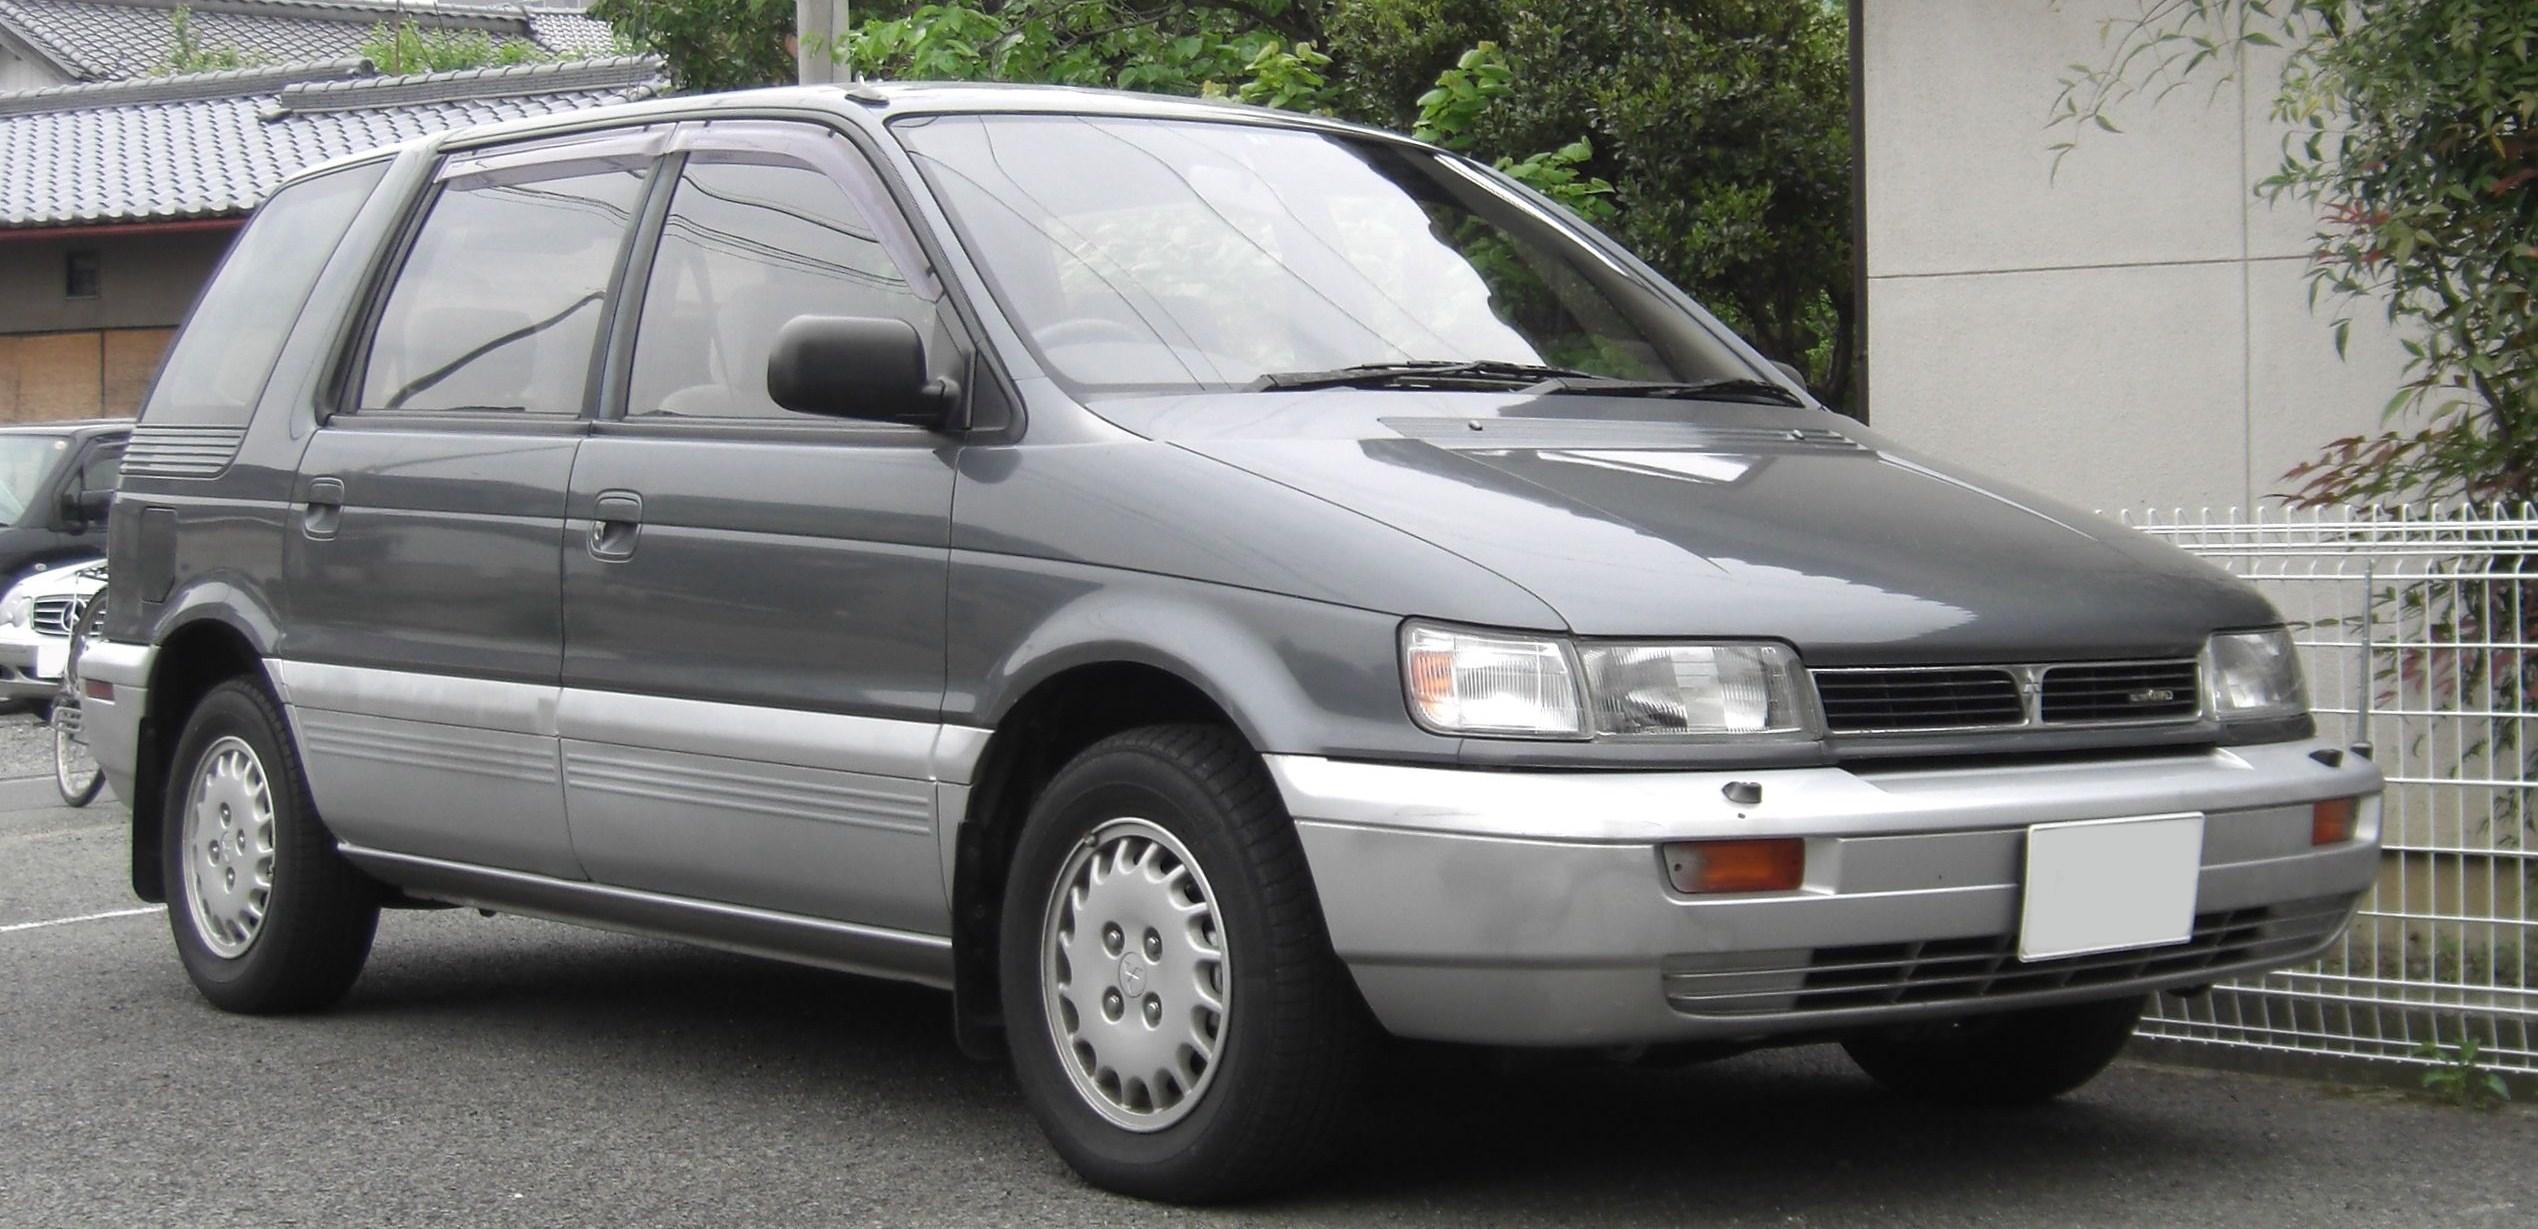 Mitsubishi RVR I 1991 - 1997 Compact MPV #4